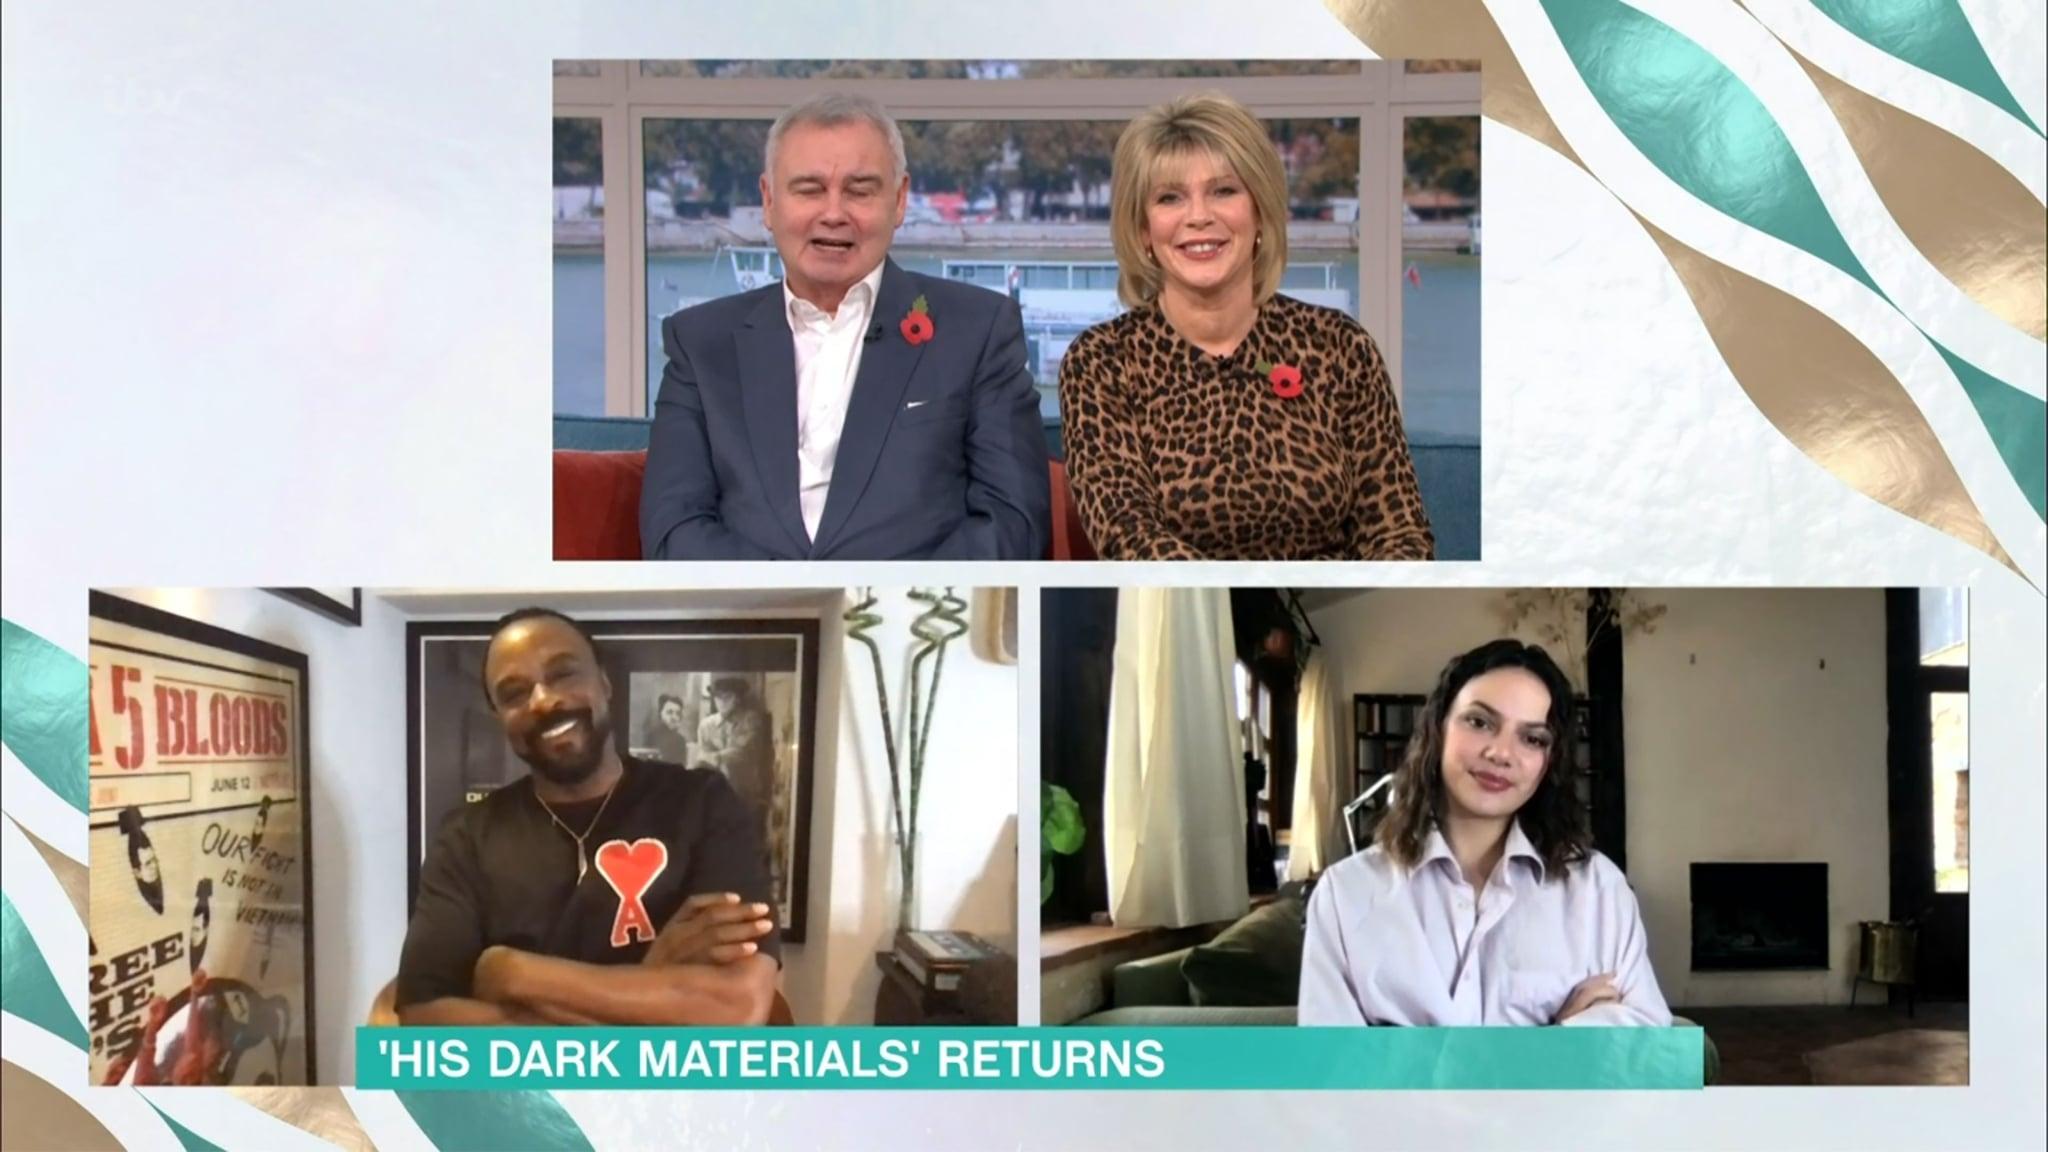 Mandatory Credit: Photo by ITV/Shutterstock (11003139au)Eamonn Holmes, Ruth Langsford, Ariyon Bakare and Dafne Keen'This Morning' TV Show, London, UK - 06 Nov 2020